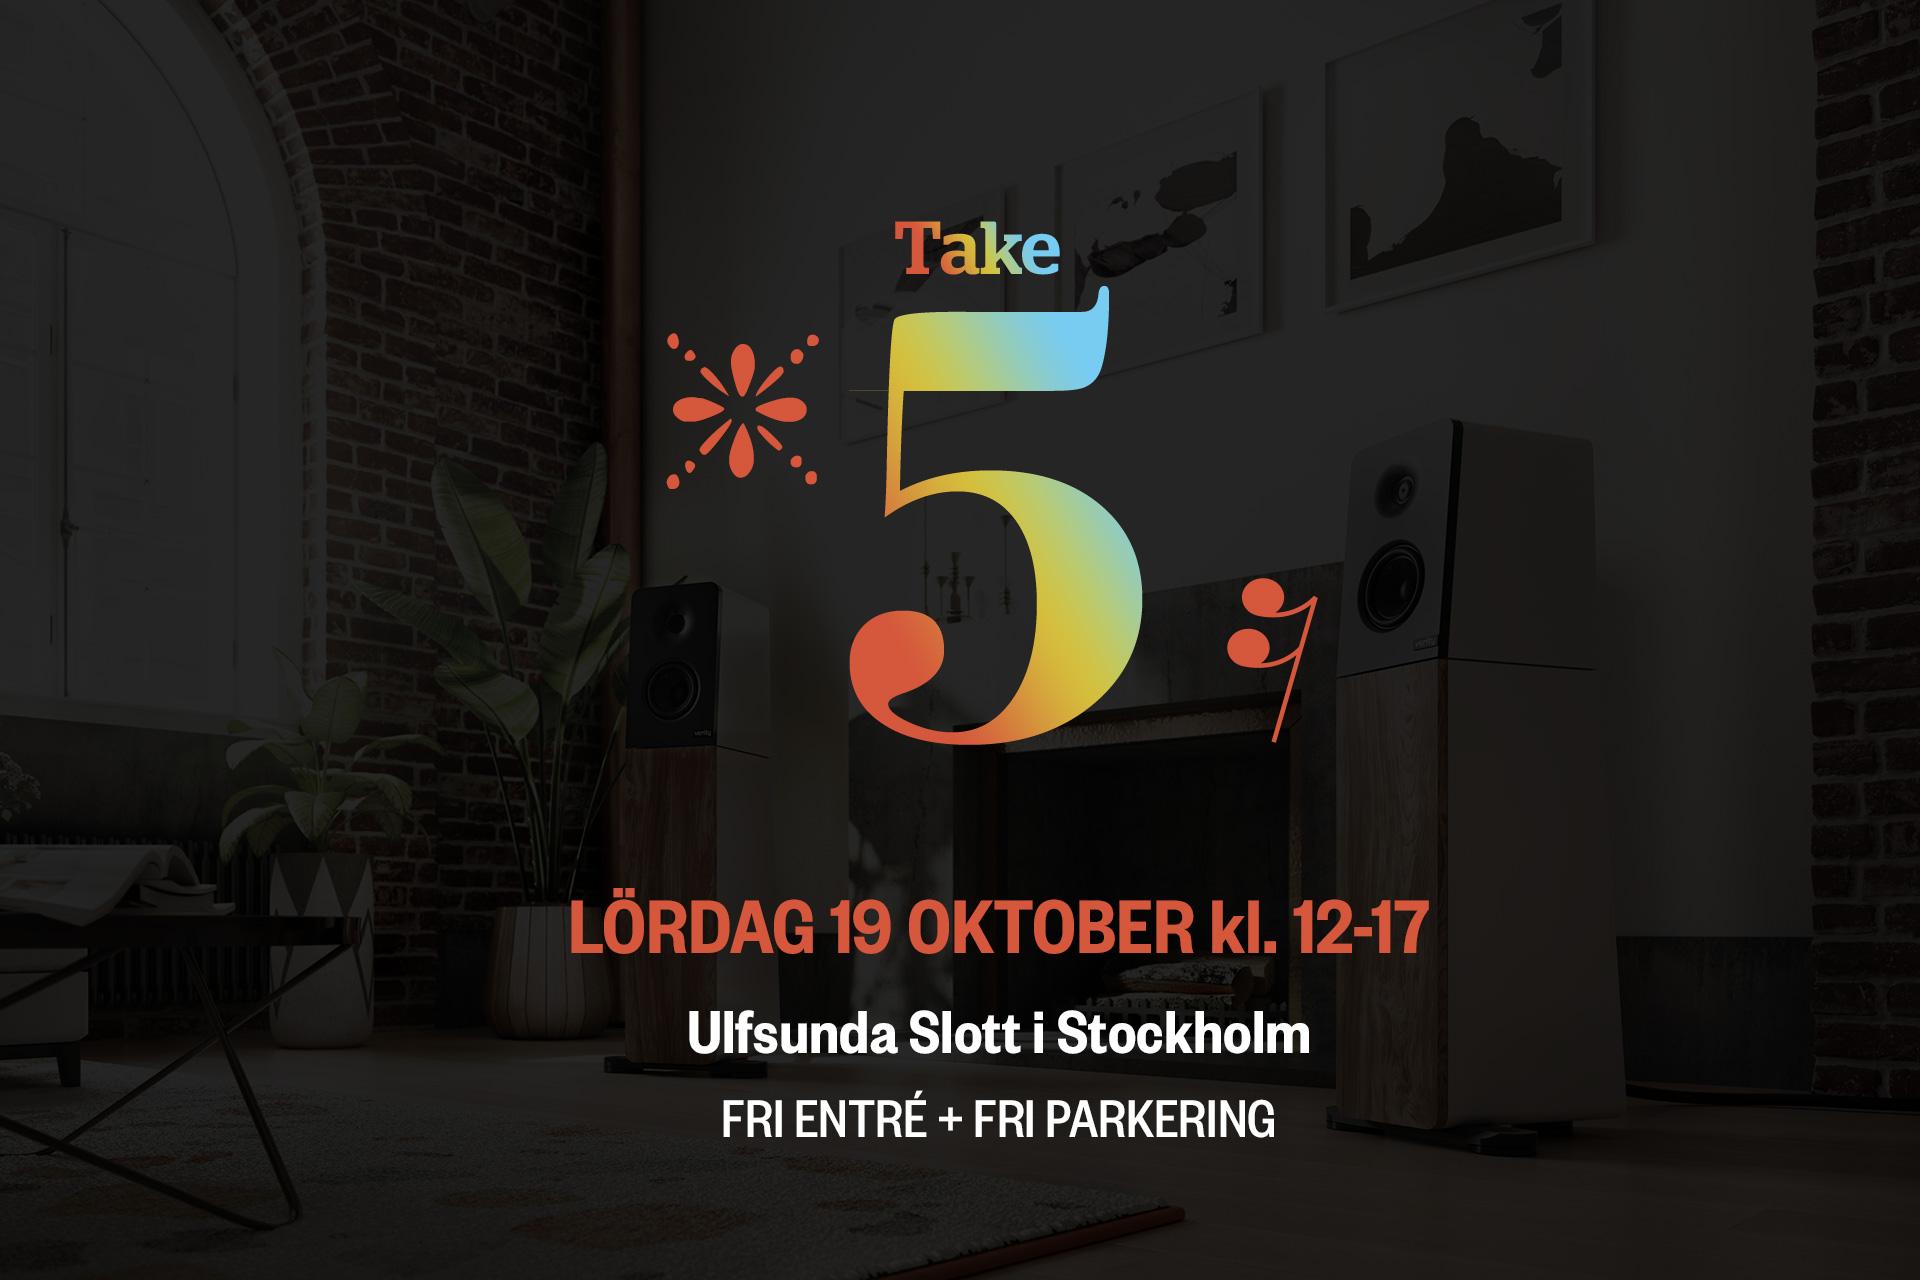 Take 5 - Ulfsunda Slott - Lördag 19 Oktober kl.12-17